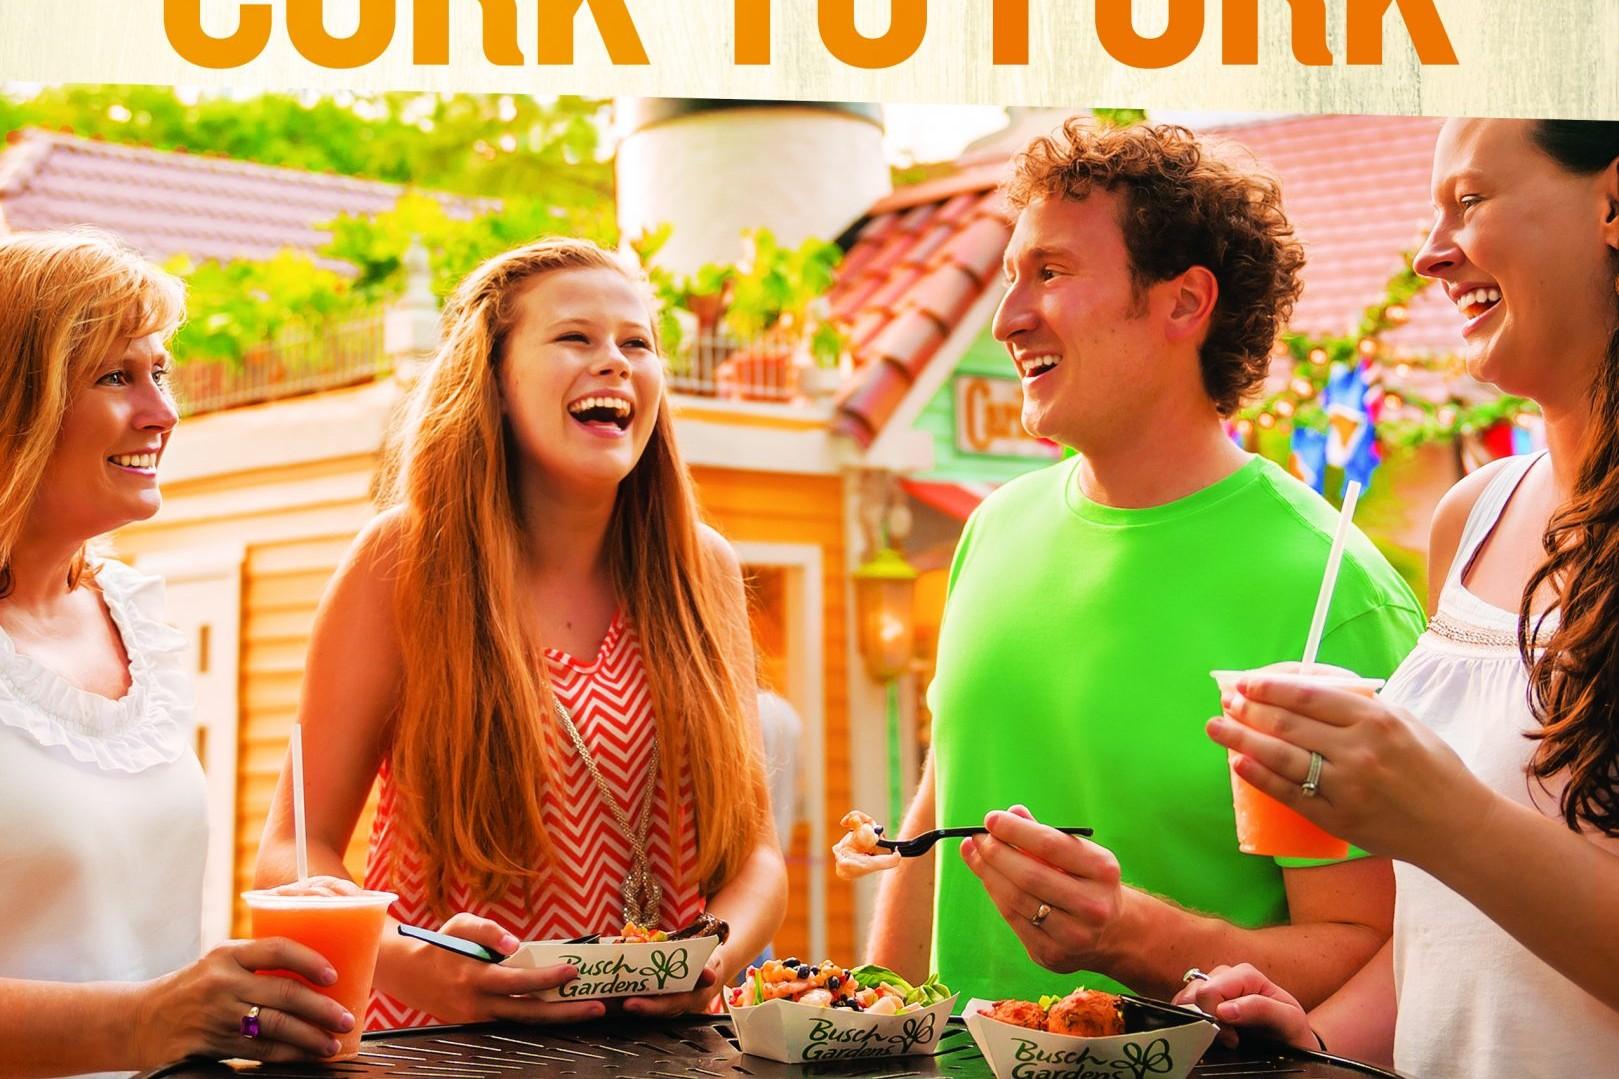 Busch Gardens Food & Wine Festival Print Design